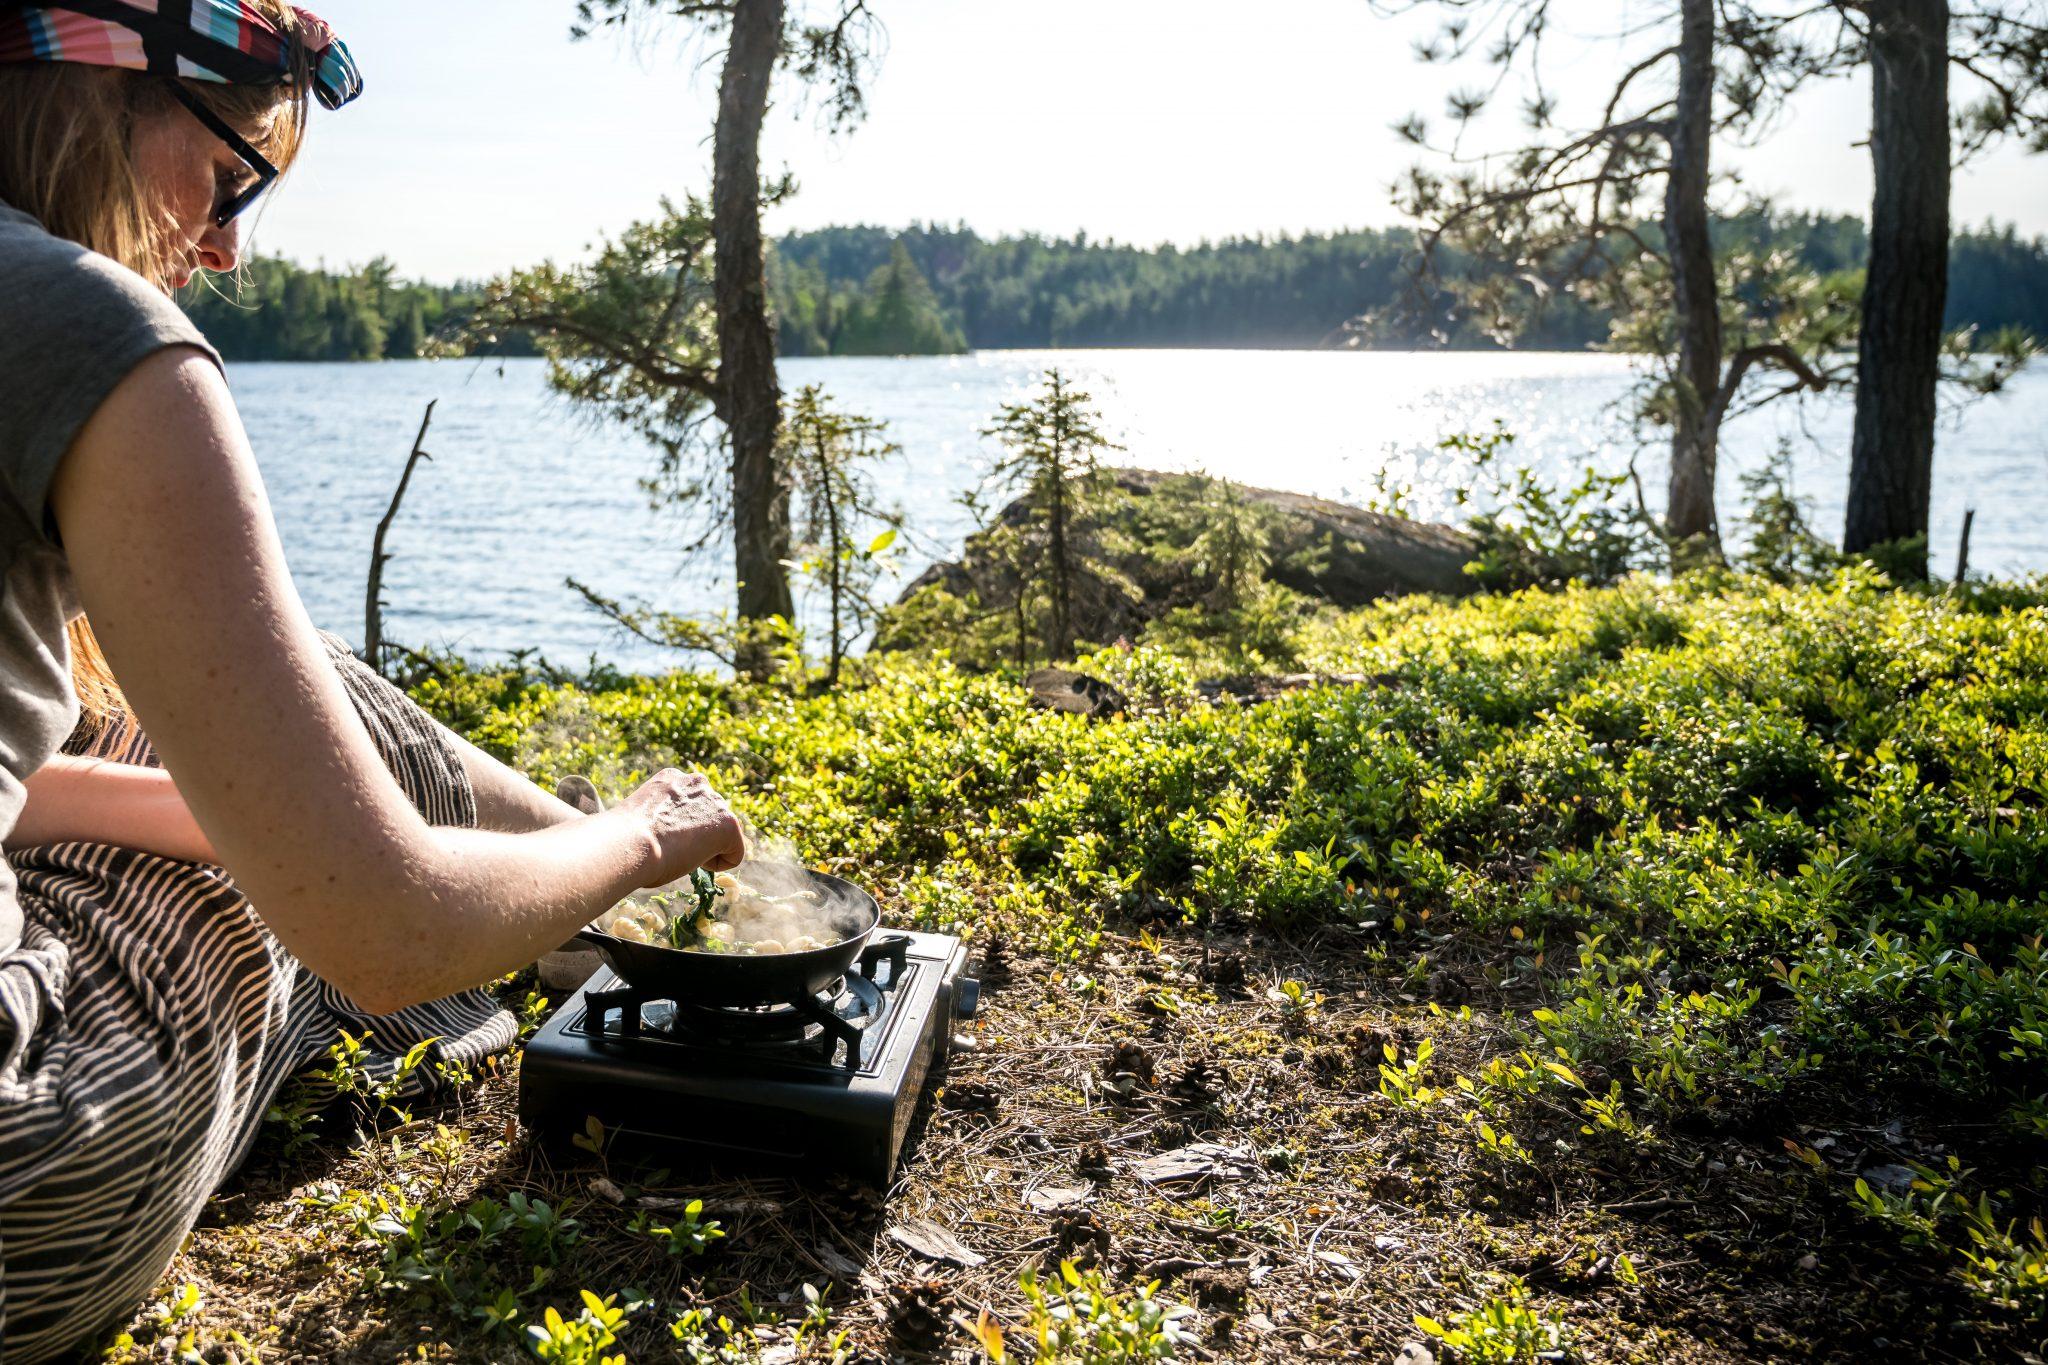 parc opémican canot-camping Québec